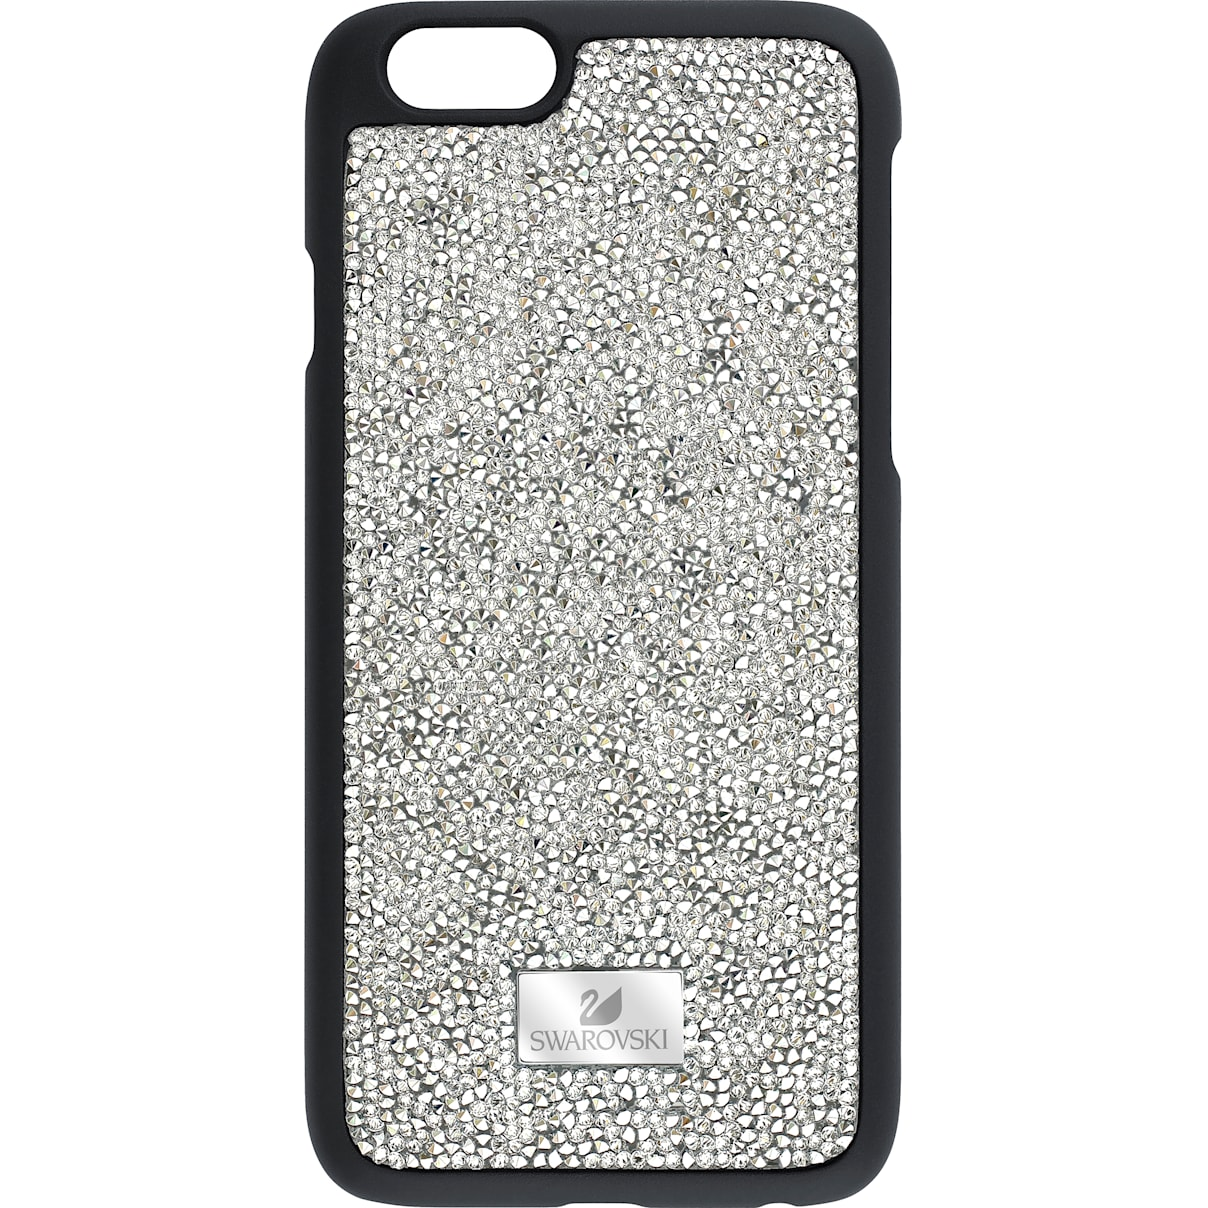 Swarovski Glam Rock Gray Smartphone Case with Bumper, iPhone® 6